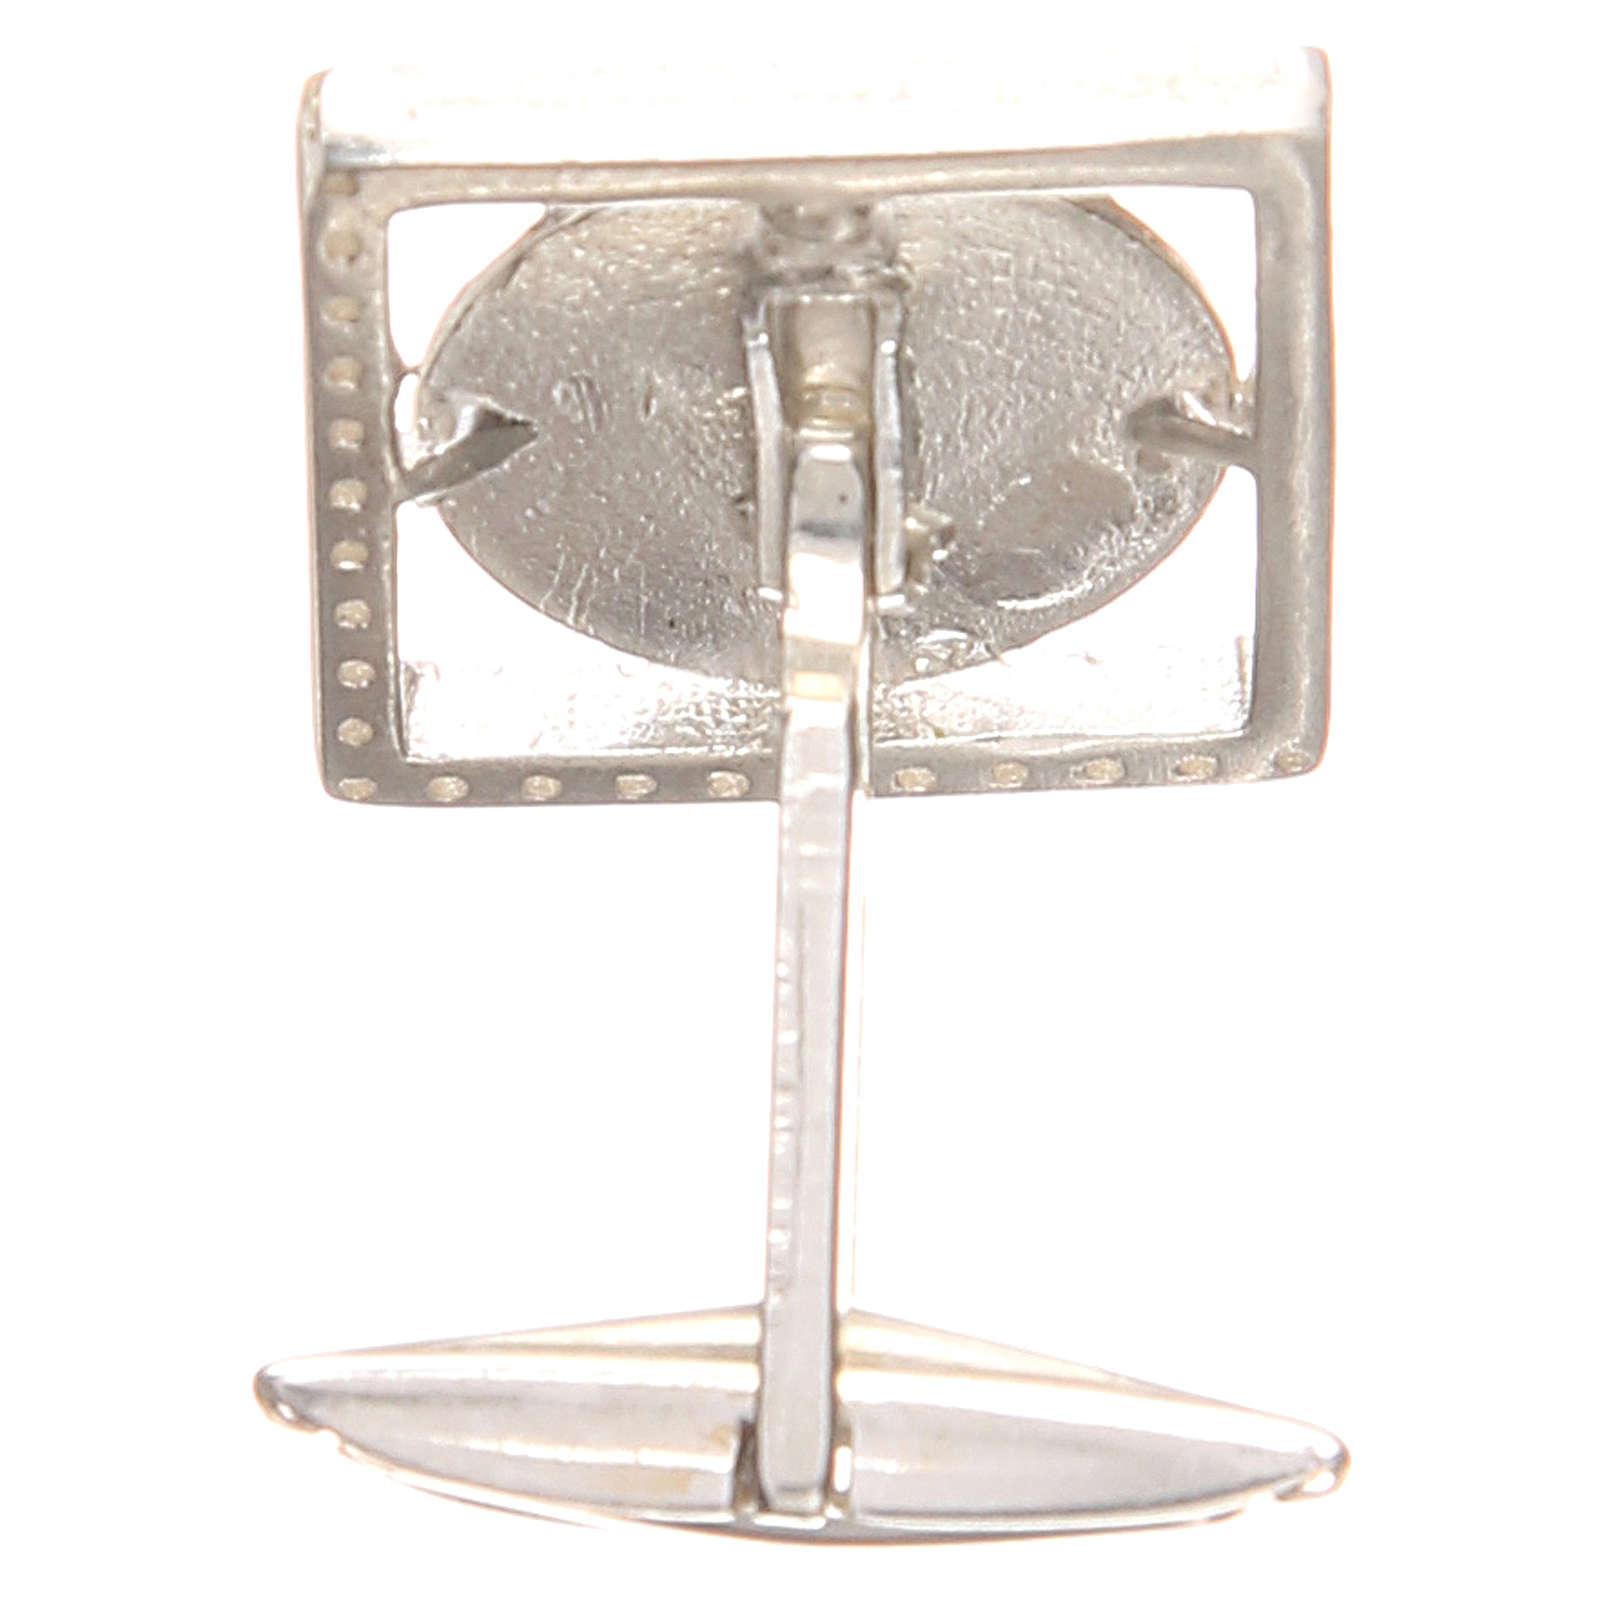 Gemelli gioielli argento 800 rod Sant'Antonio Padova 1,7x1,7 cm 4